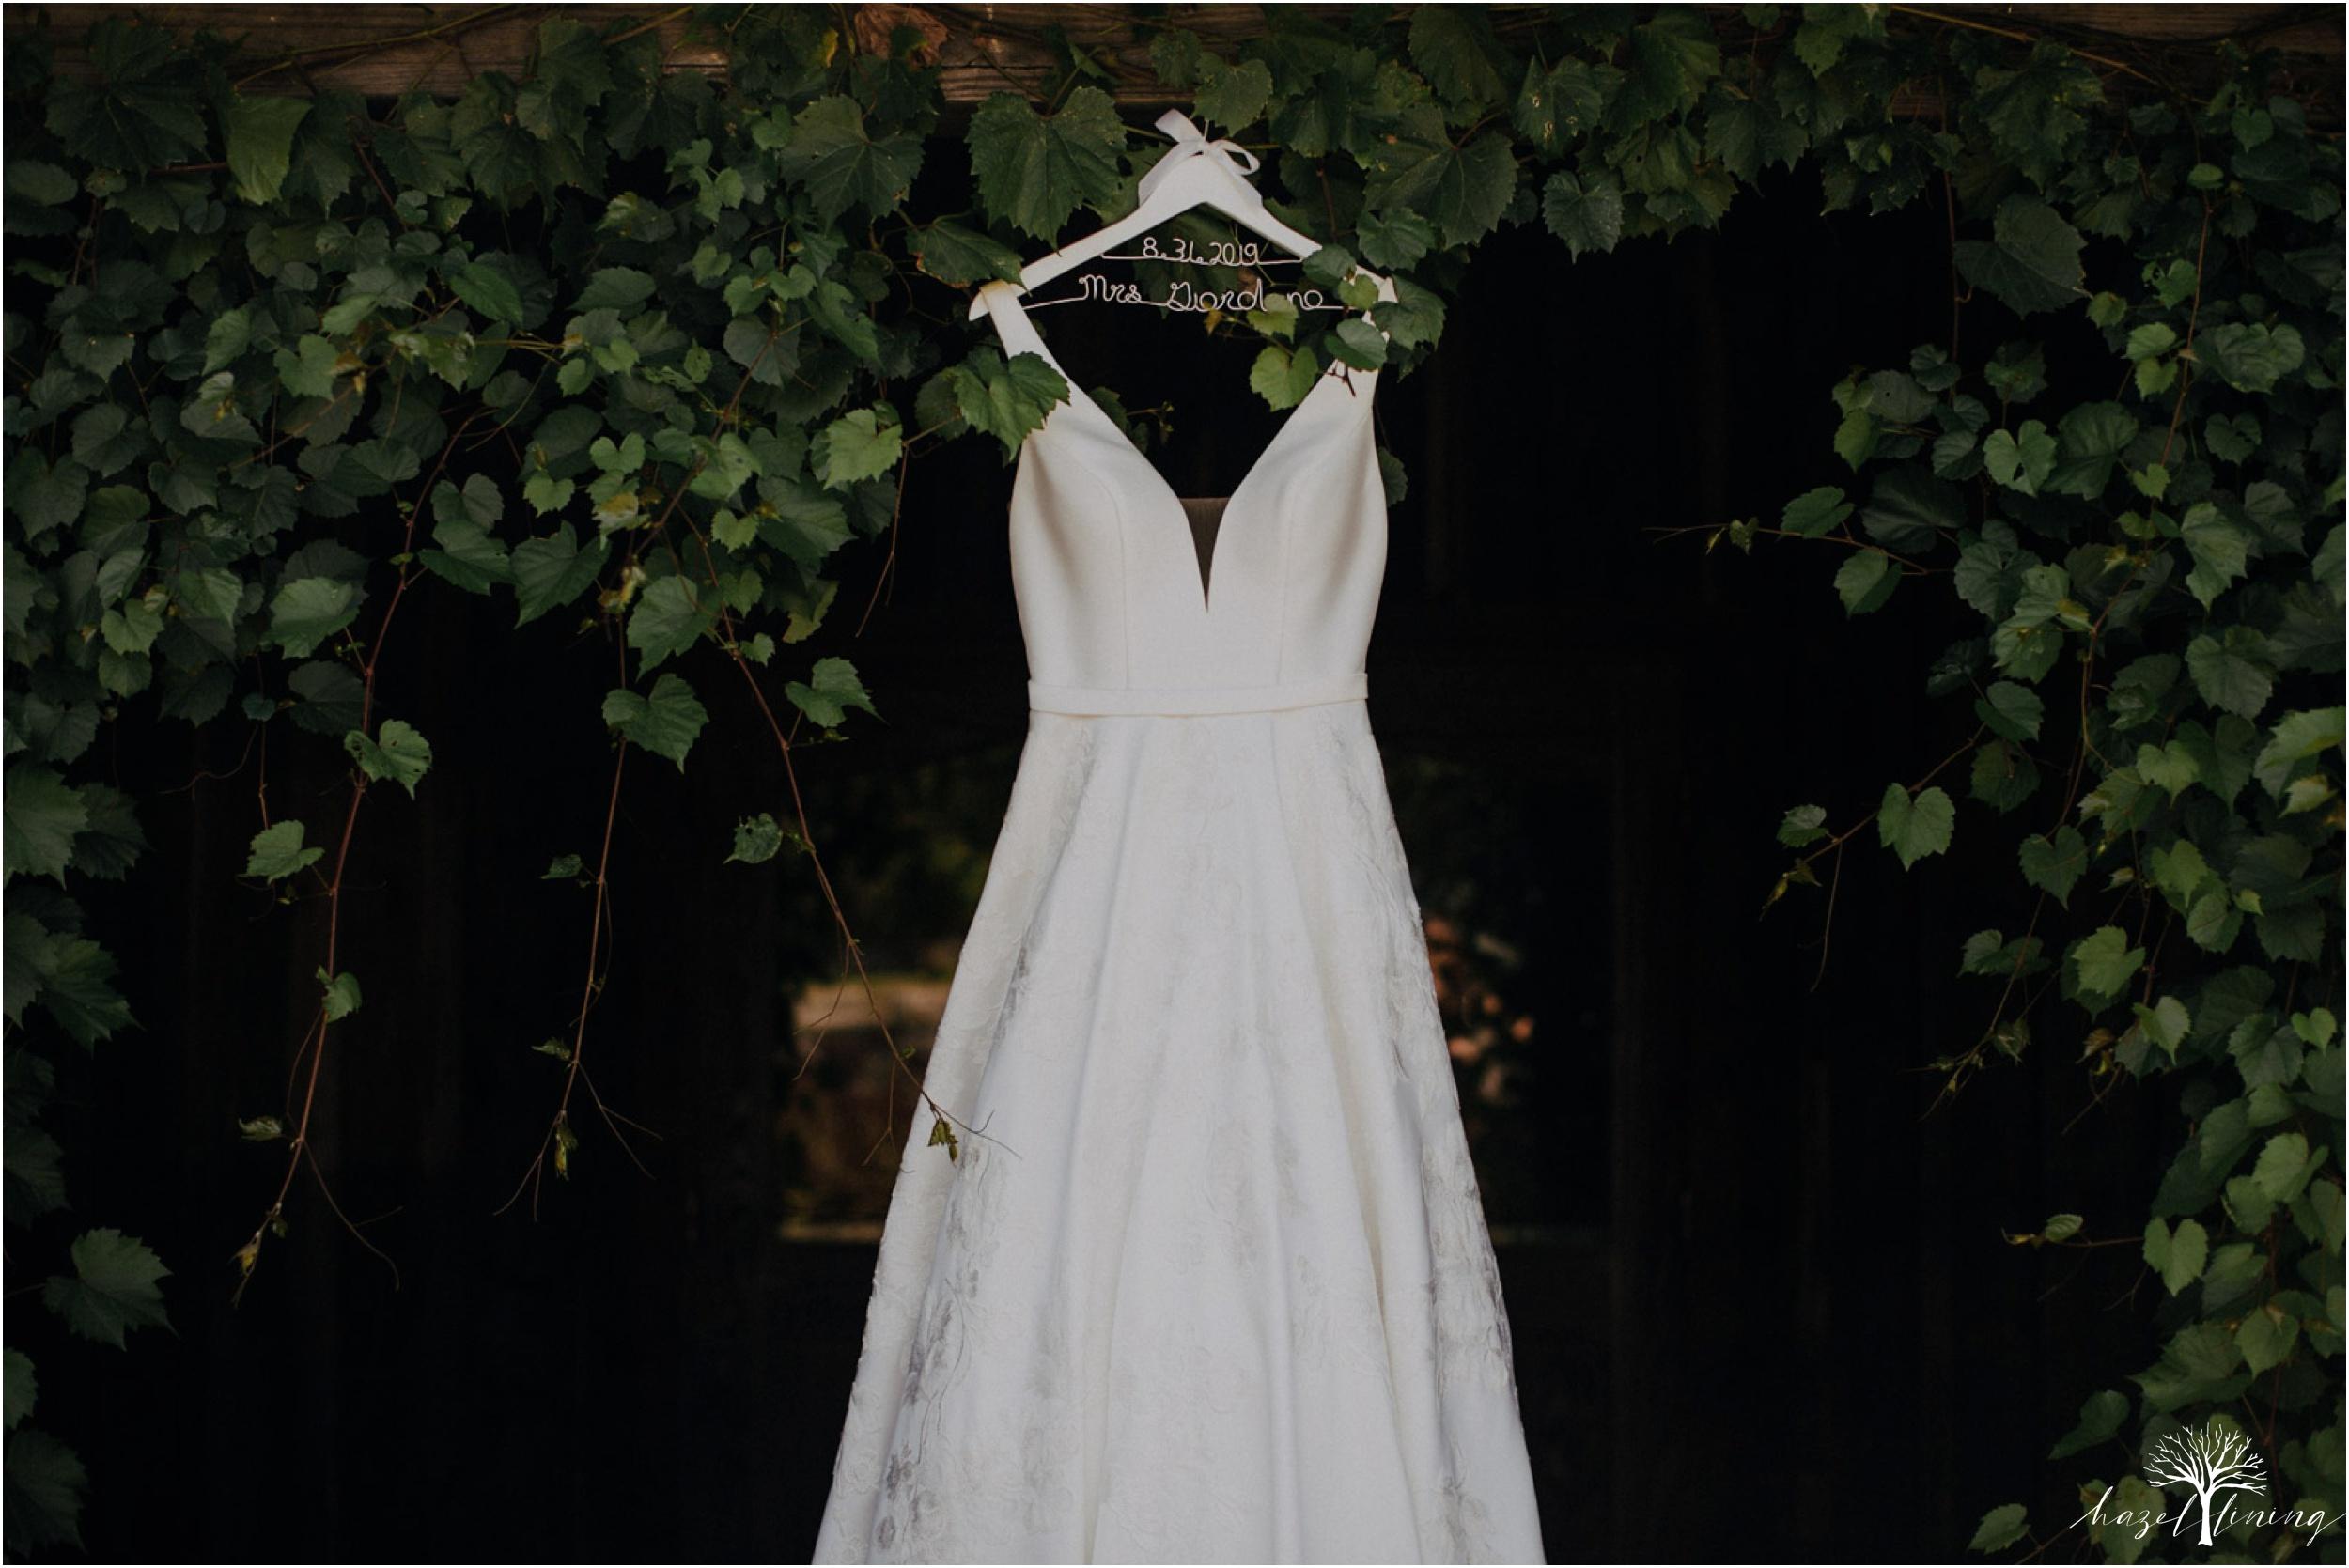 maureen-hepner-anthony-giordano-rose-bank-winery-newtow-pennsylvania-luxury-summer-wedding-hazel-lining-photography-destination-elopement-wedding-engagement-photography_0006.jpg